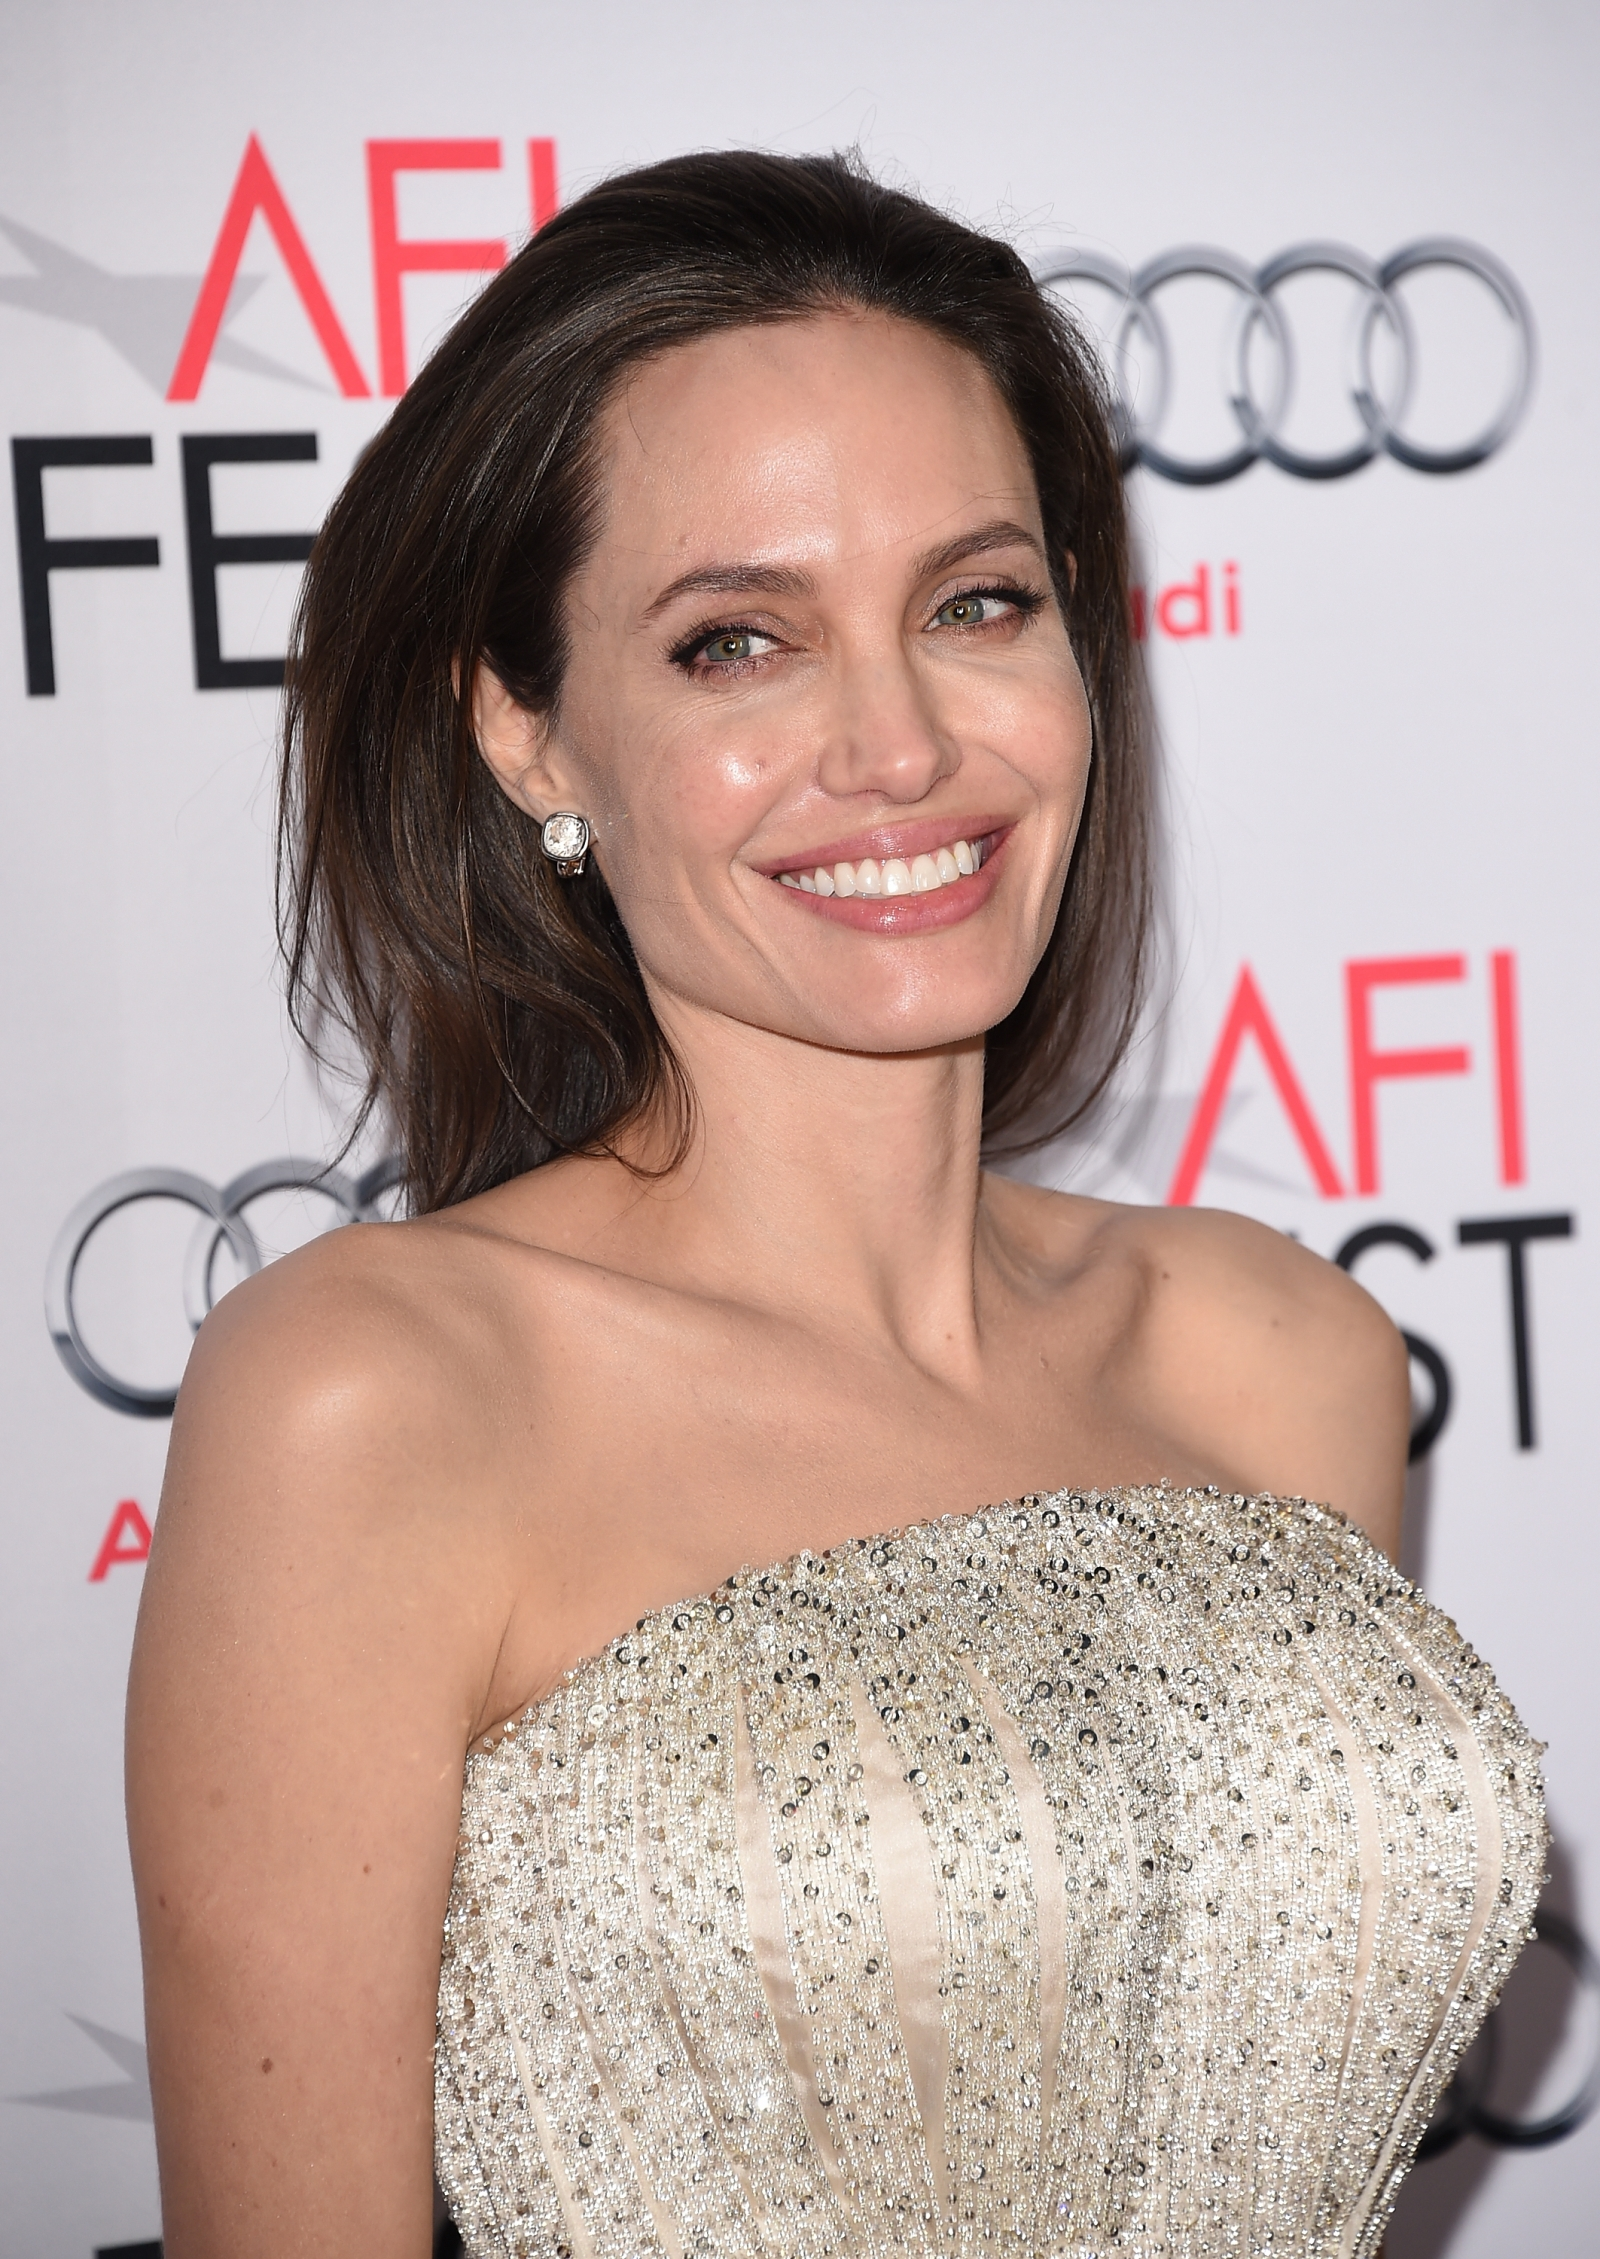 Angelina Jolie 'frustrated and hurt' as Brad Pitt ... Angelina Jolie